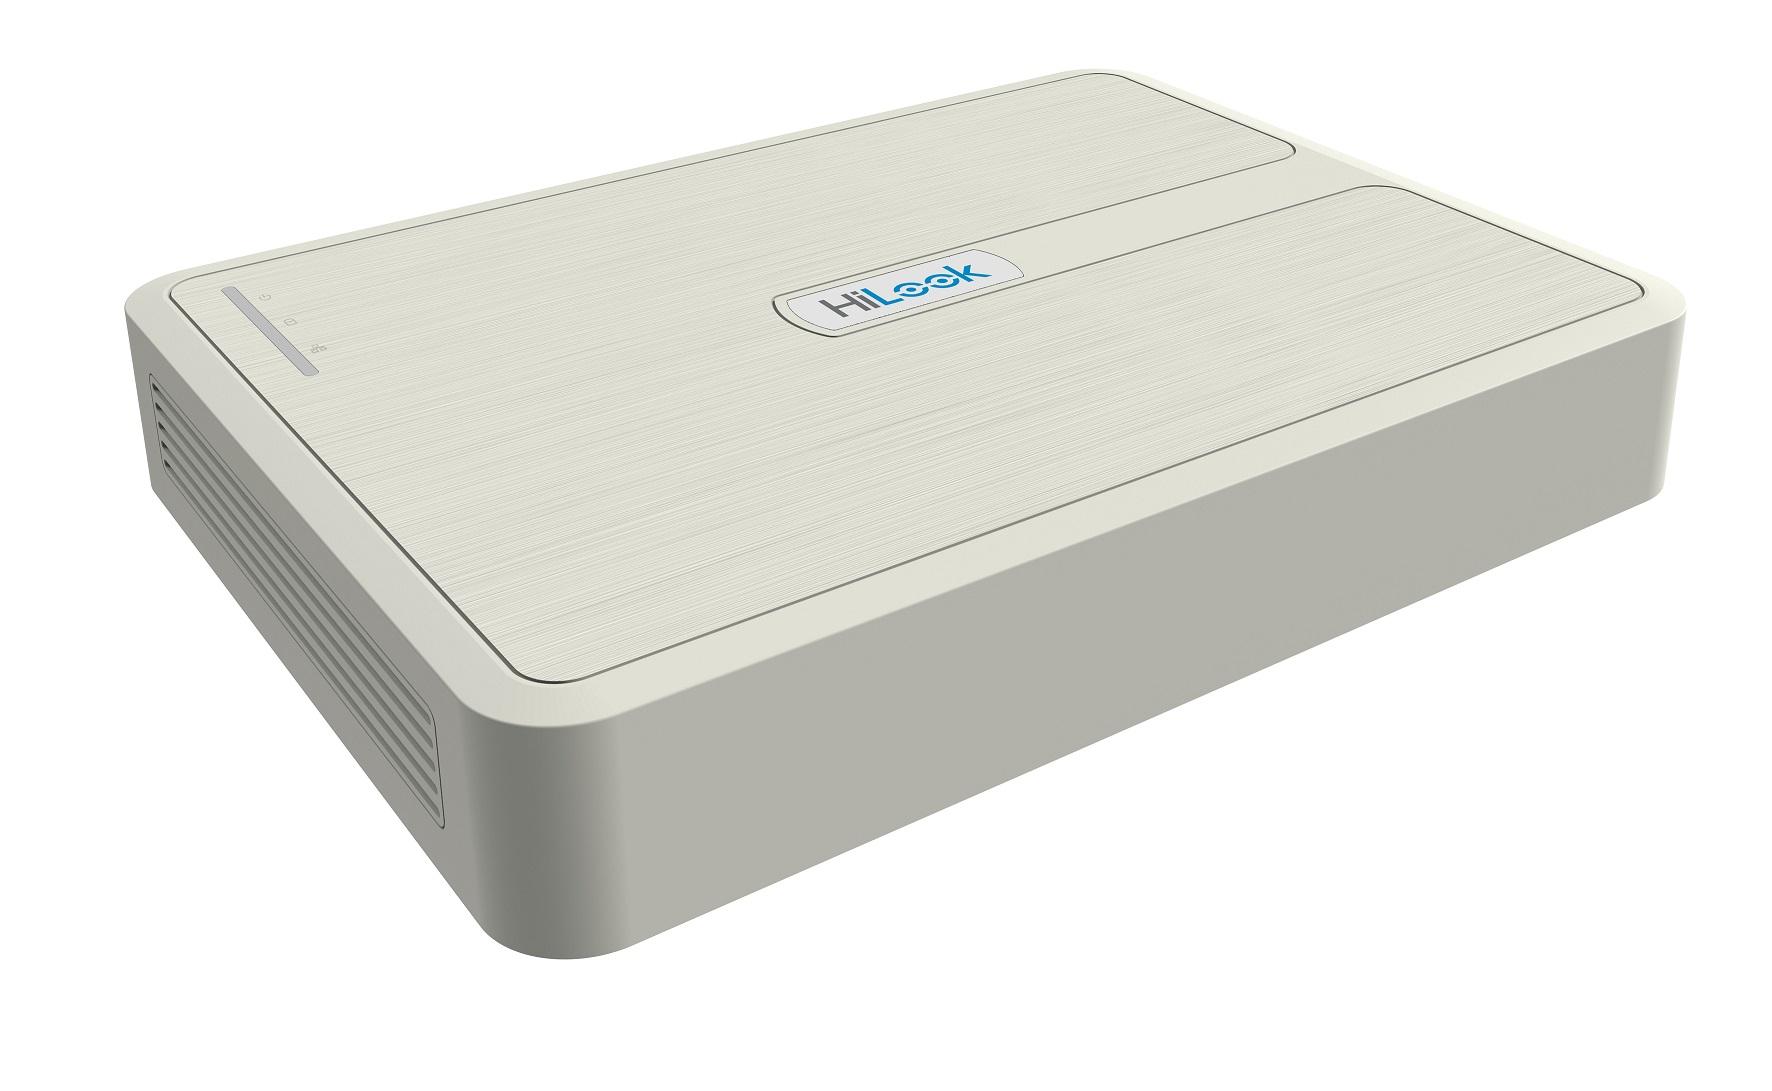 HiLook NVR-108H-D/8P network video recorder 1U White